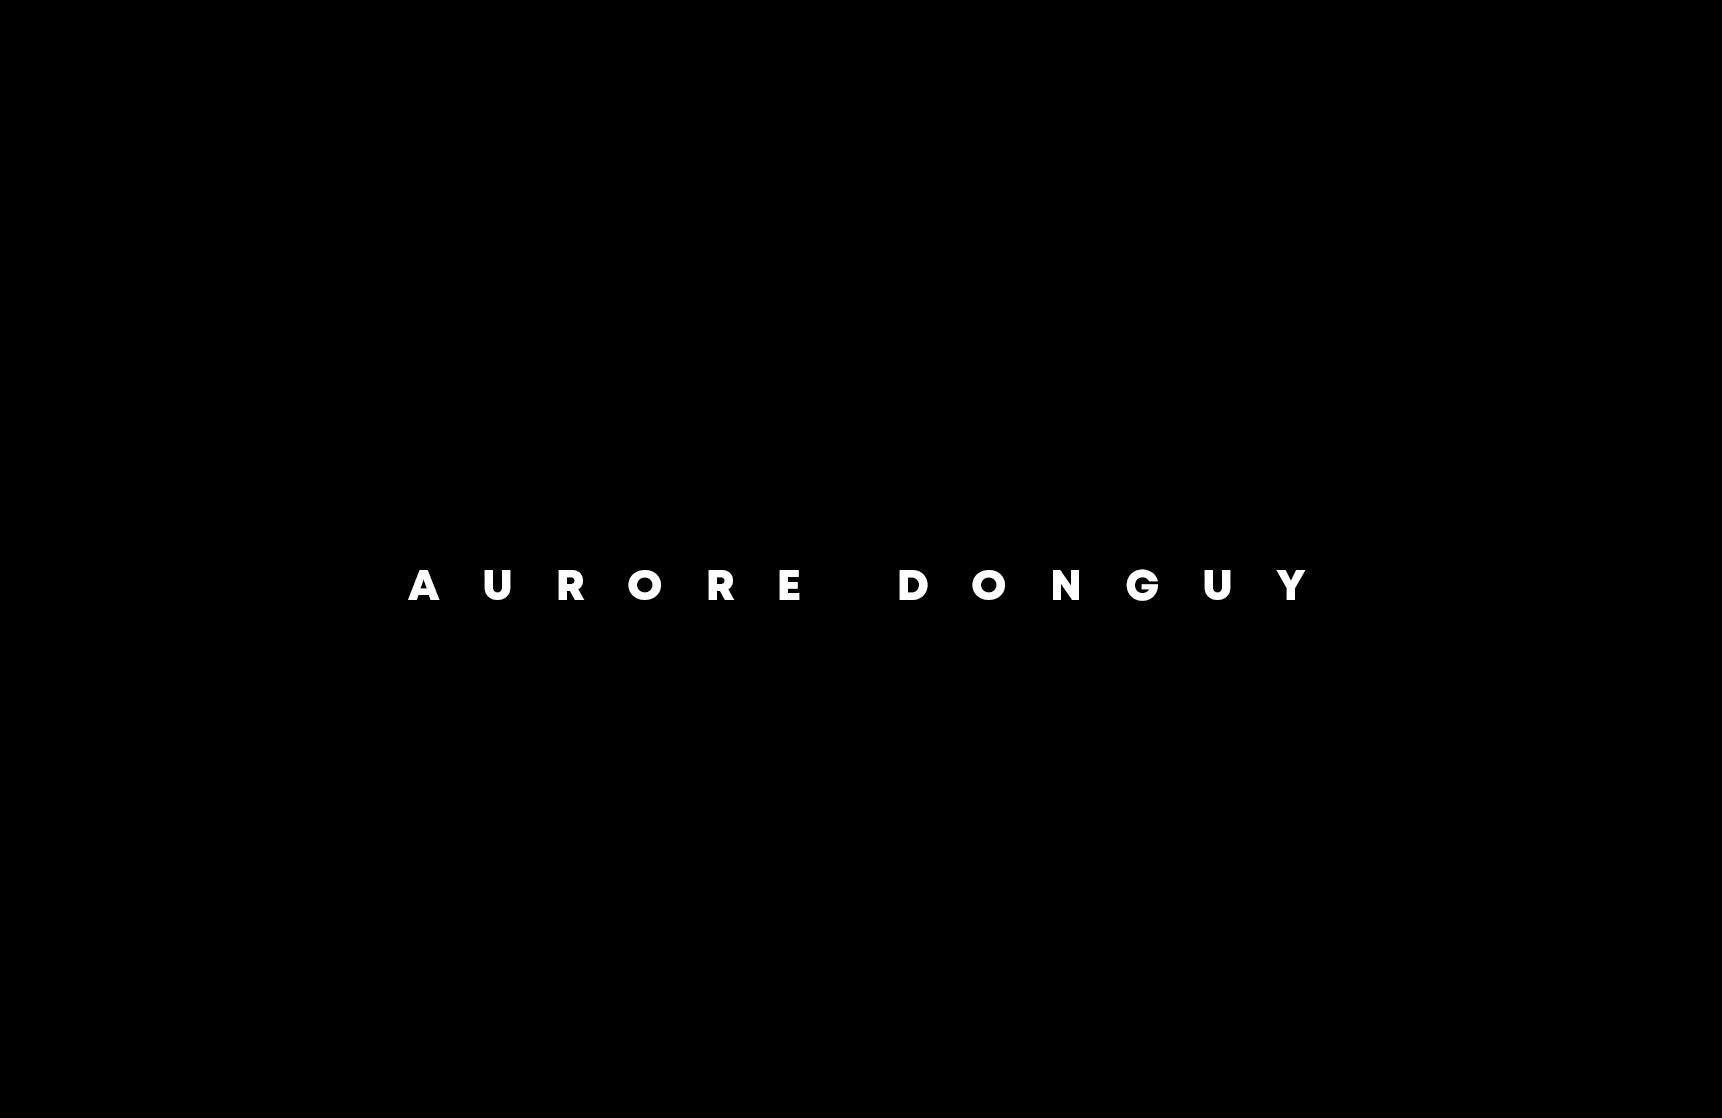 aurore-donguy-femme-du-maroc-8-min